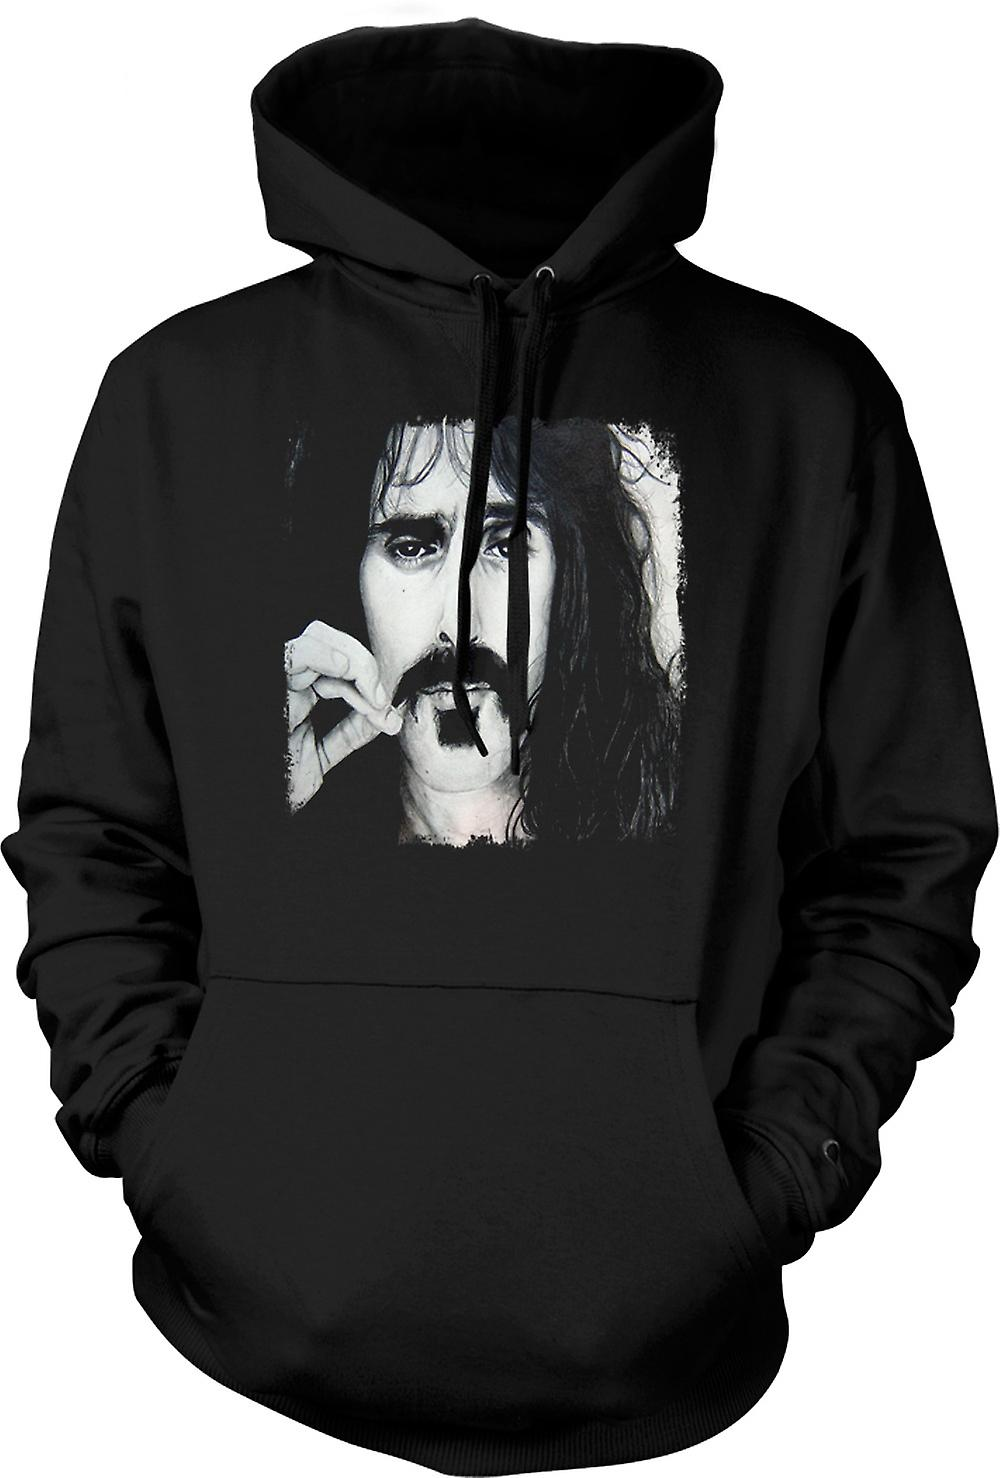 Mens Hoodie - Frank Zappa - Portrait Sketch